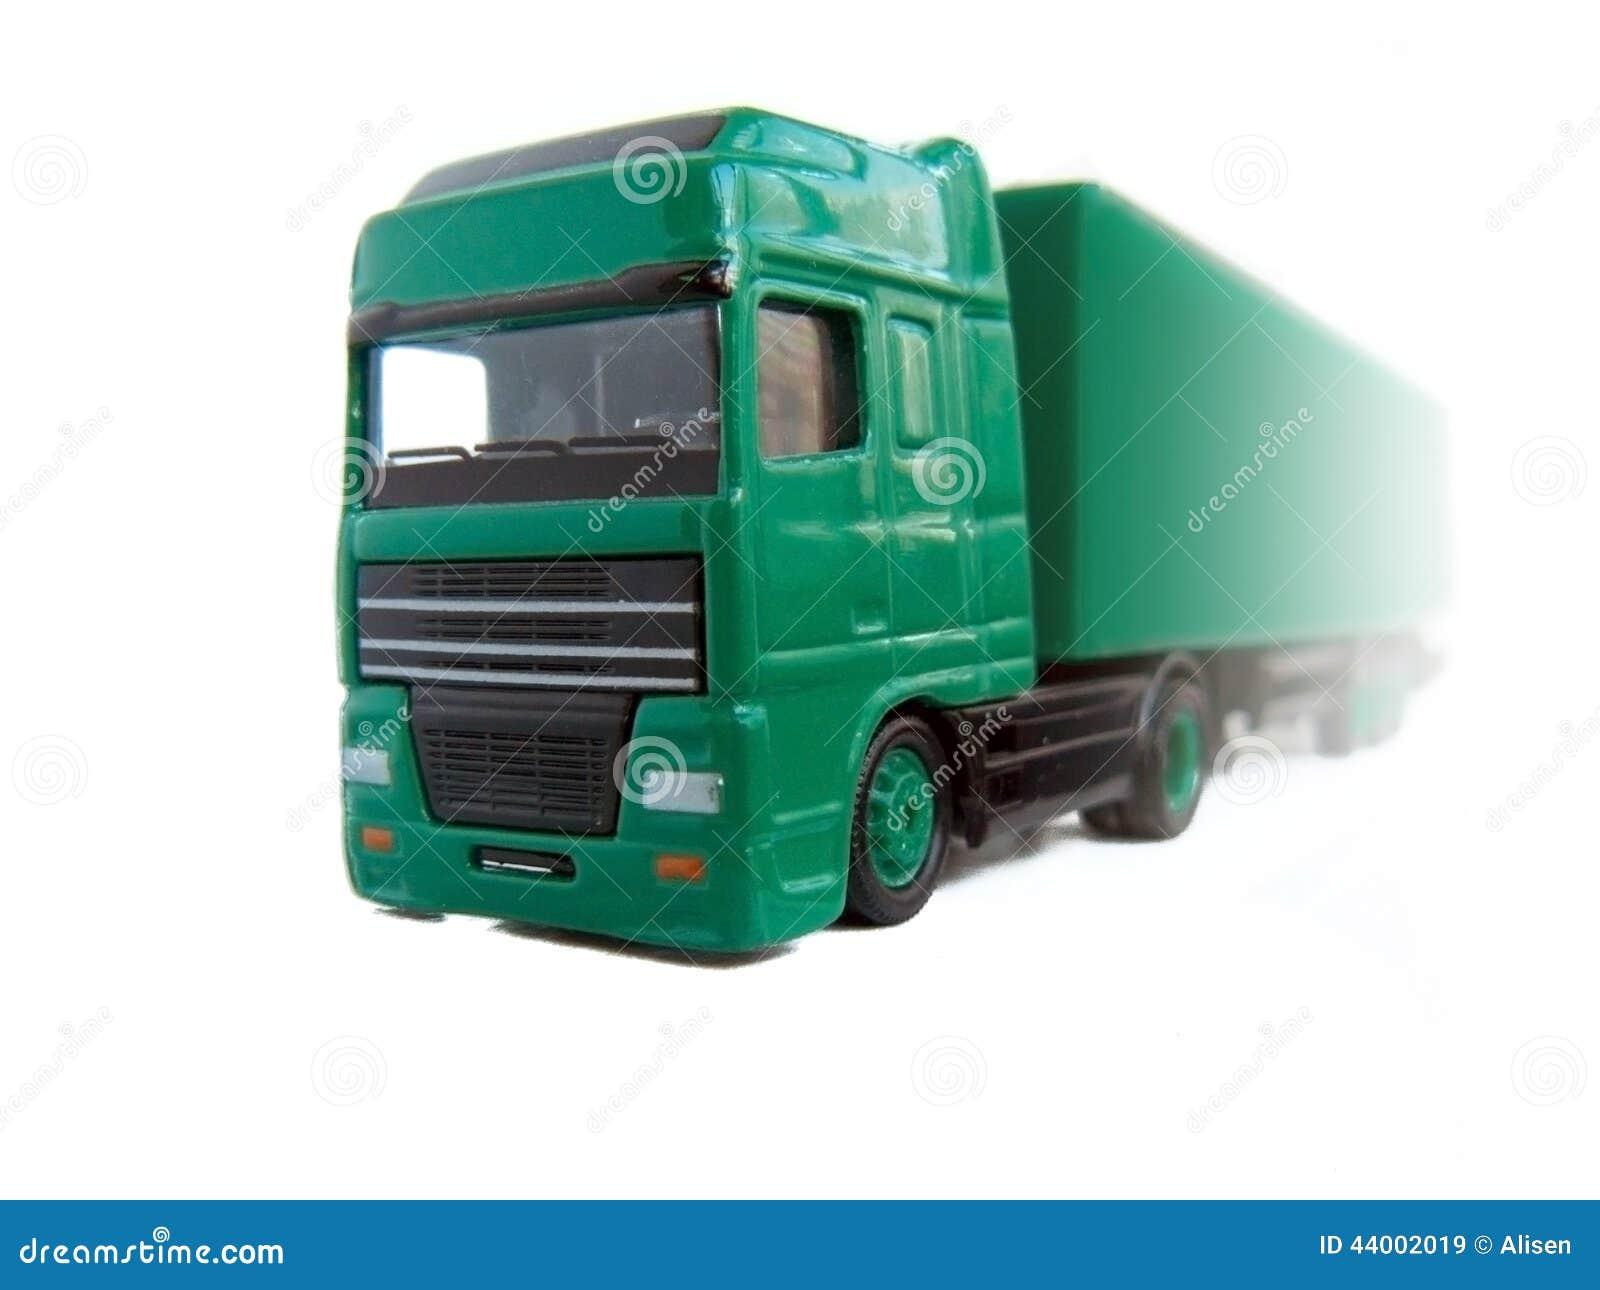 Motor vehicle for transportations